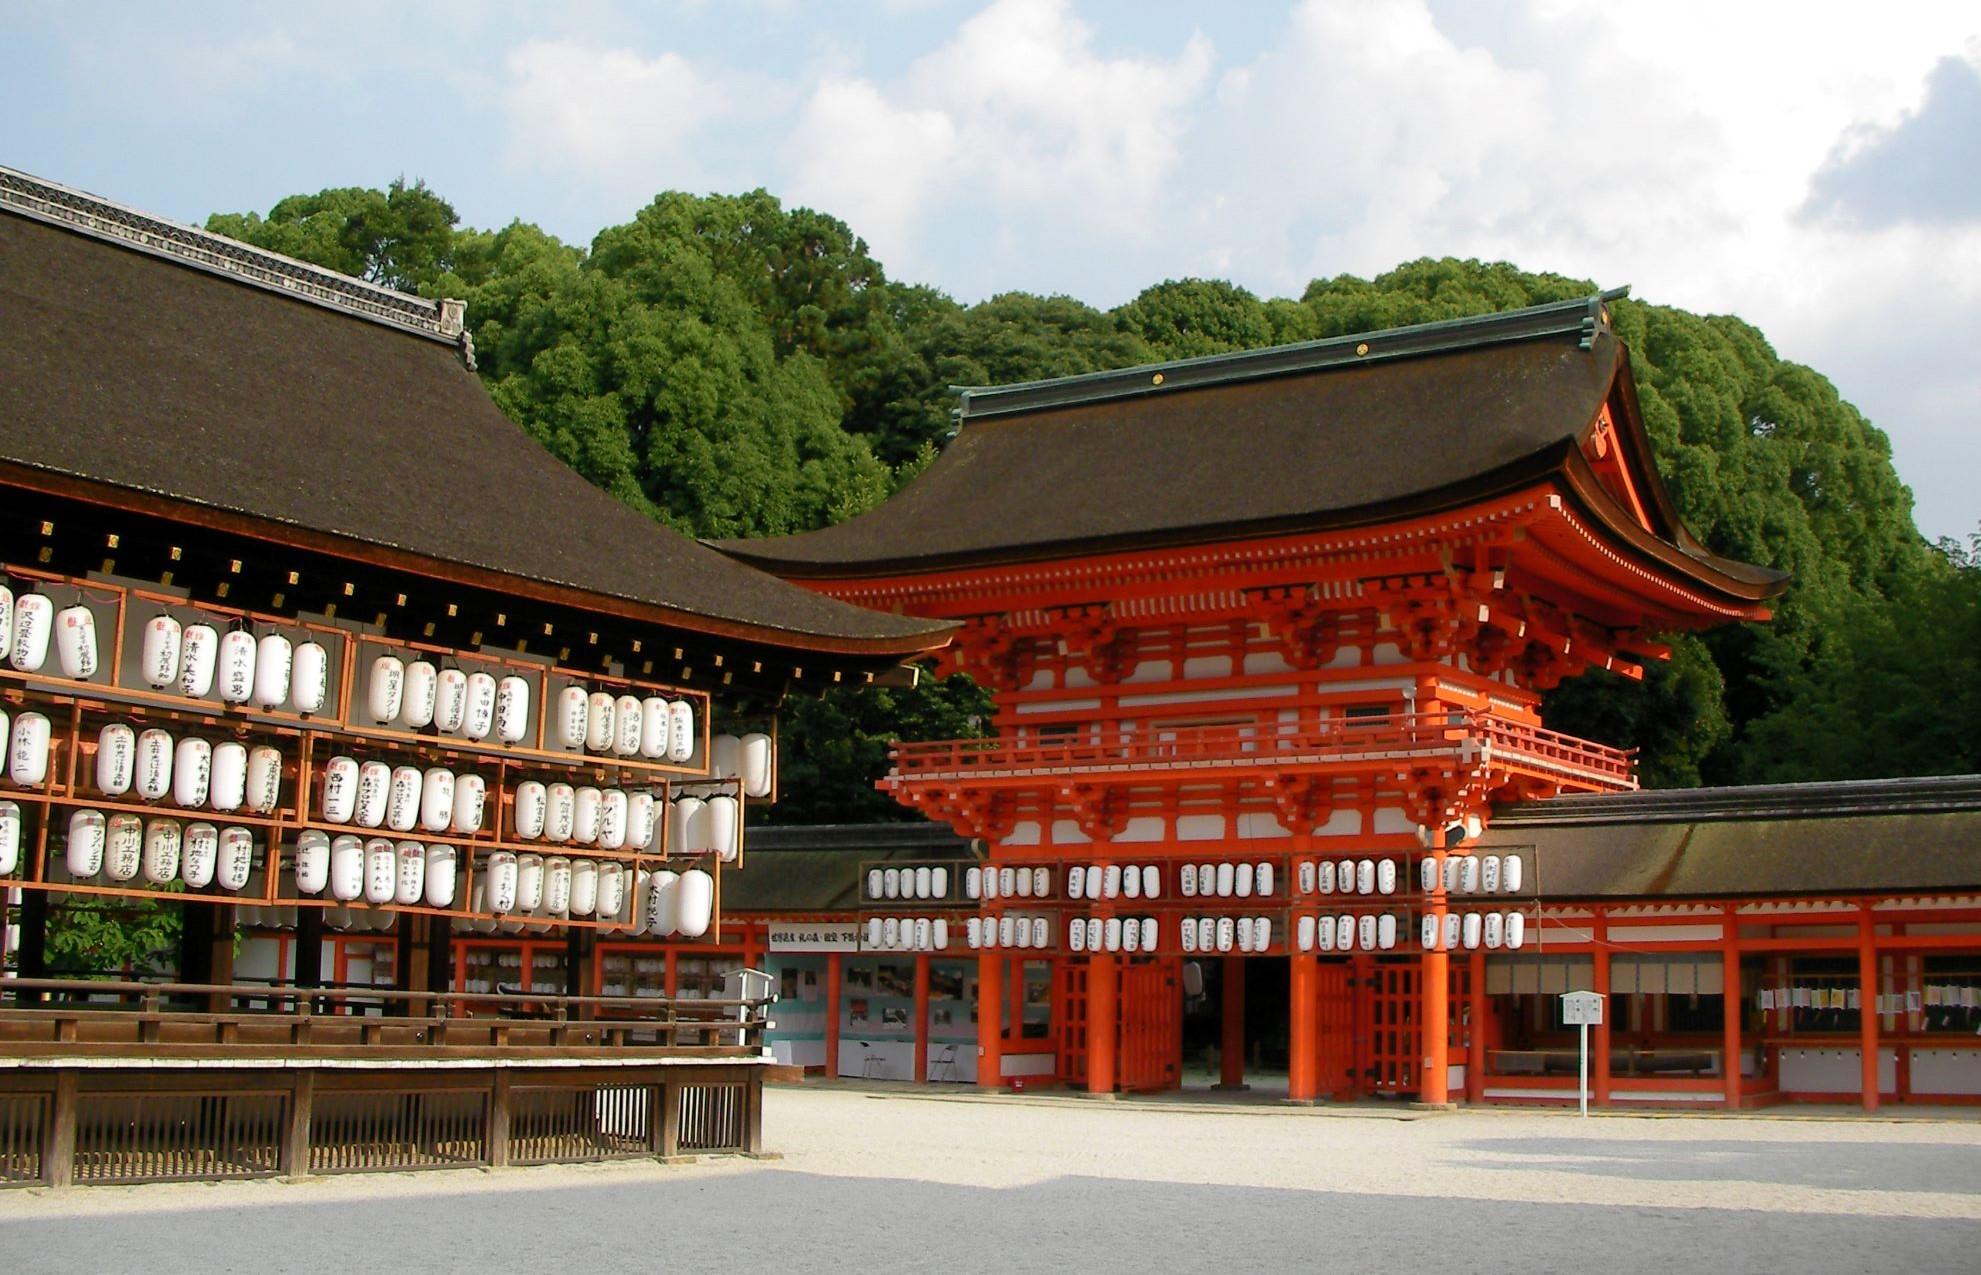 Shimogamo-jinja. Credit: Mikel Lizarralde. Licensed under CC BY-SA 2.0.